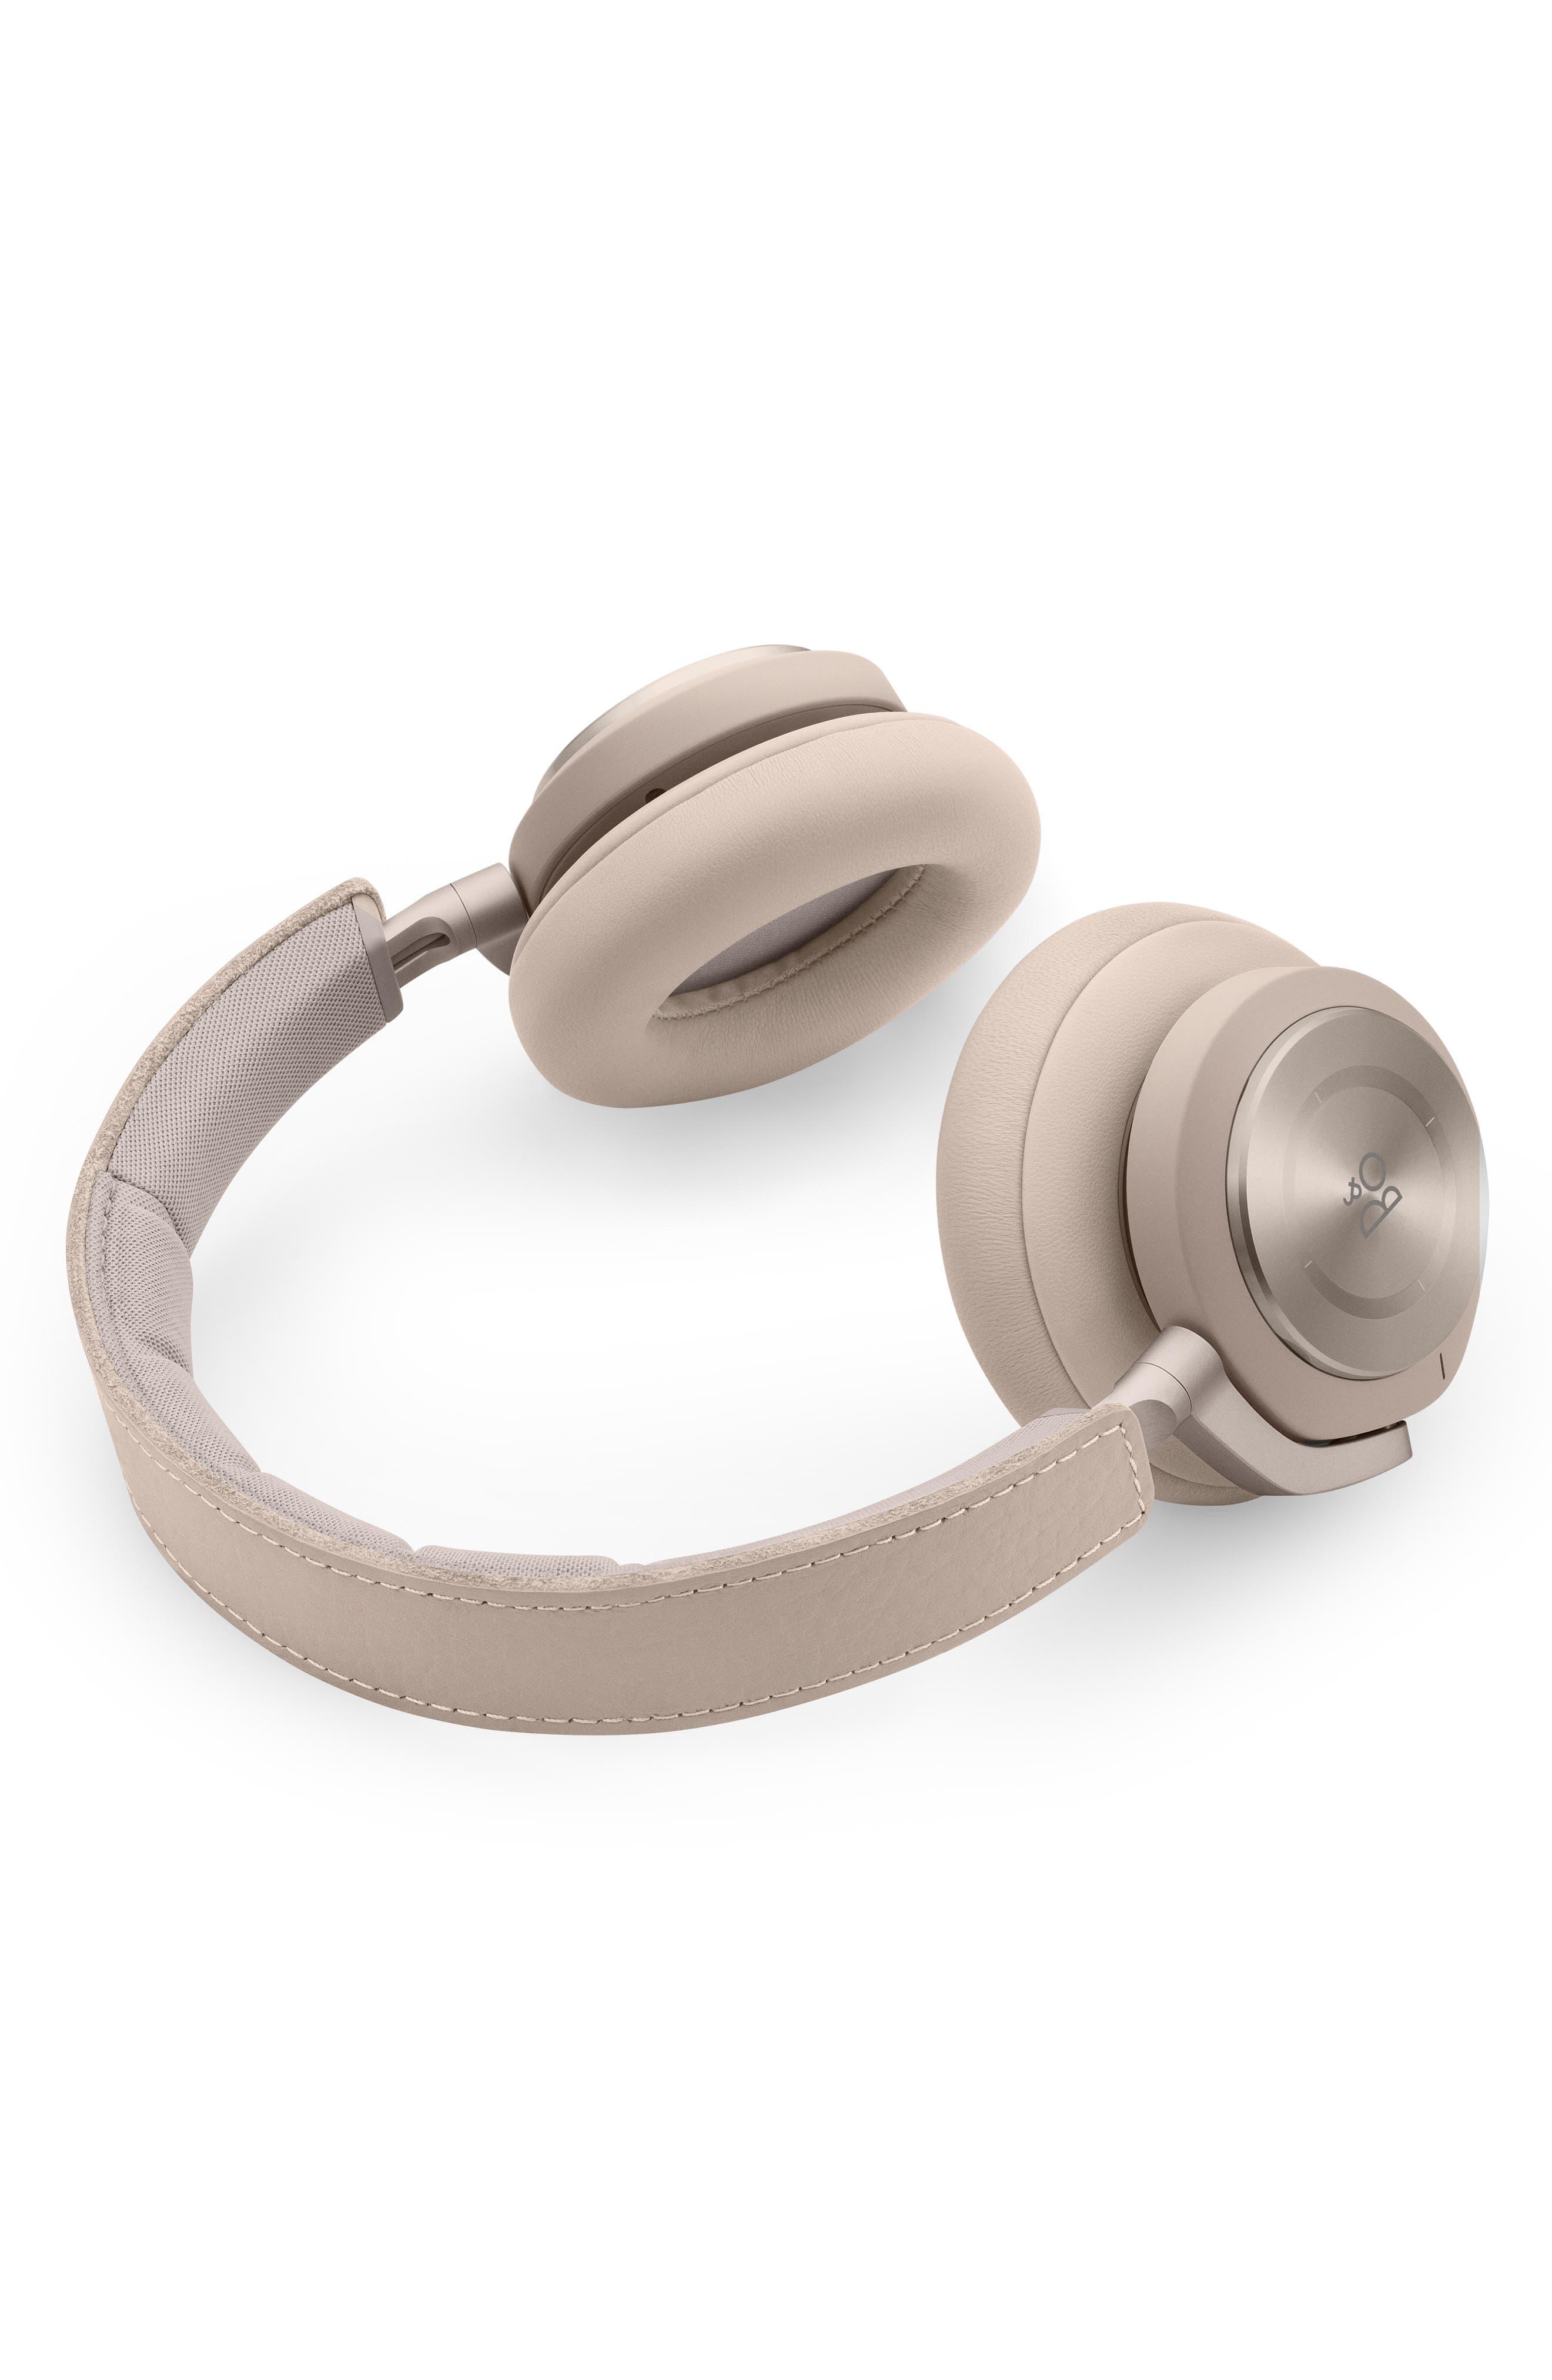 H9I Wireless Noise Canceling On-Ear Headphones,                             Alternate thumbnail 3, color,                             LIMESTONE